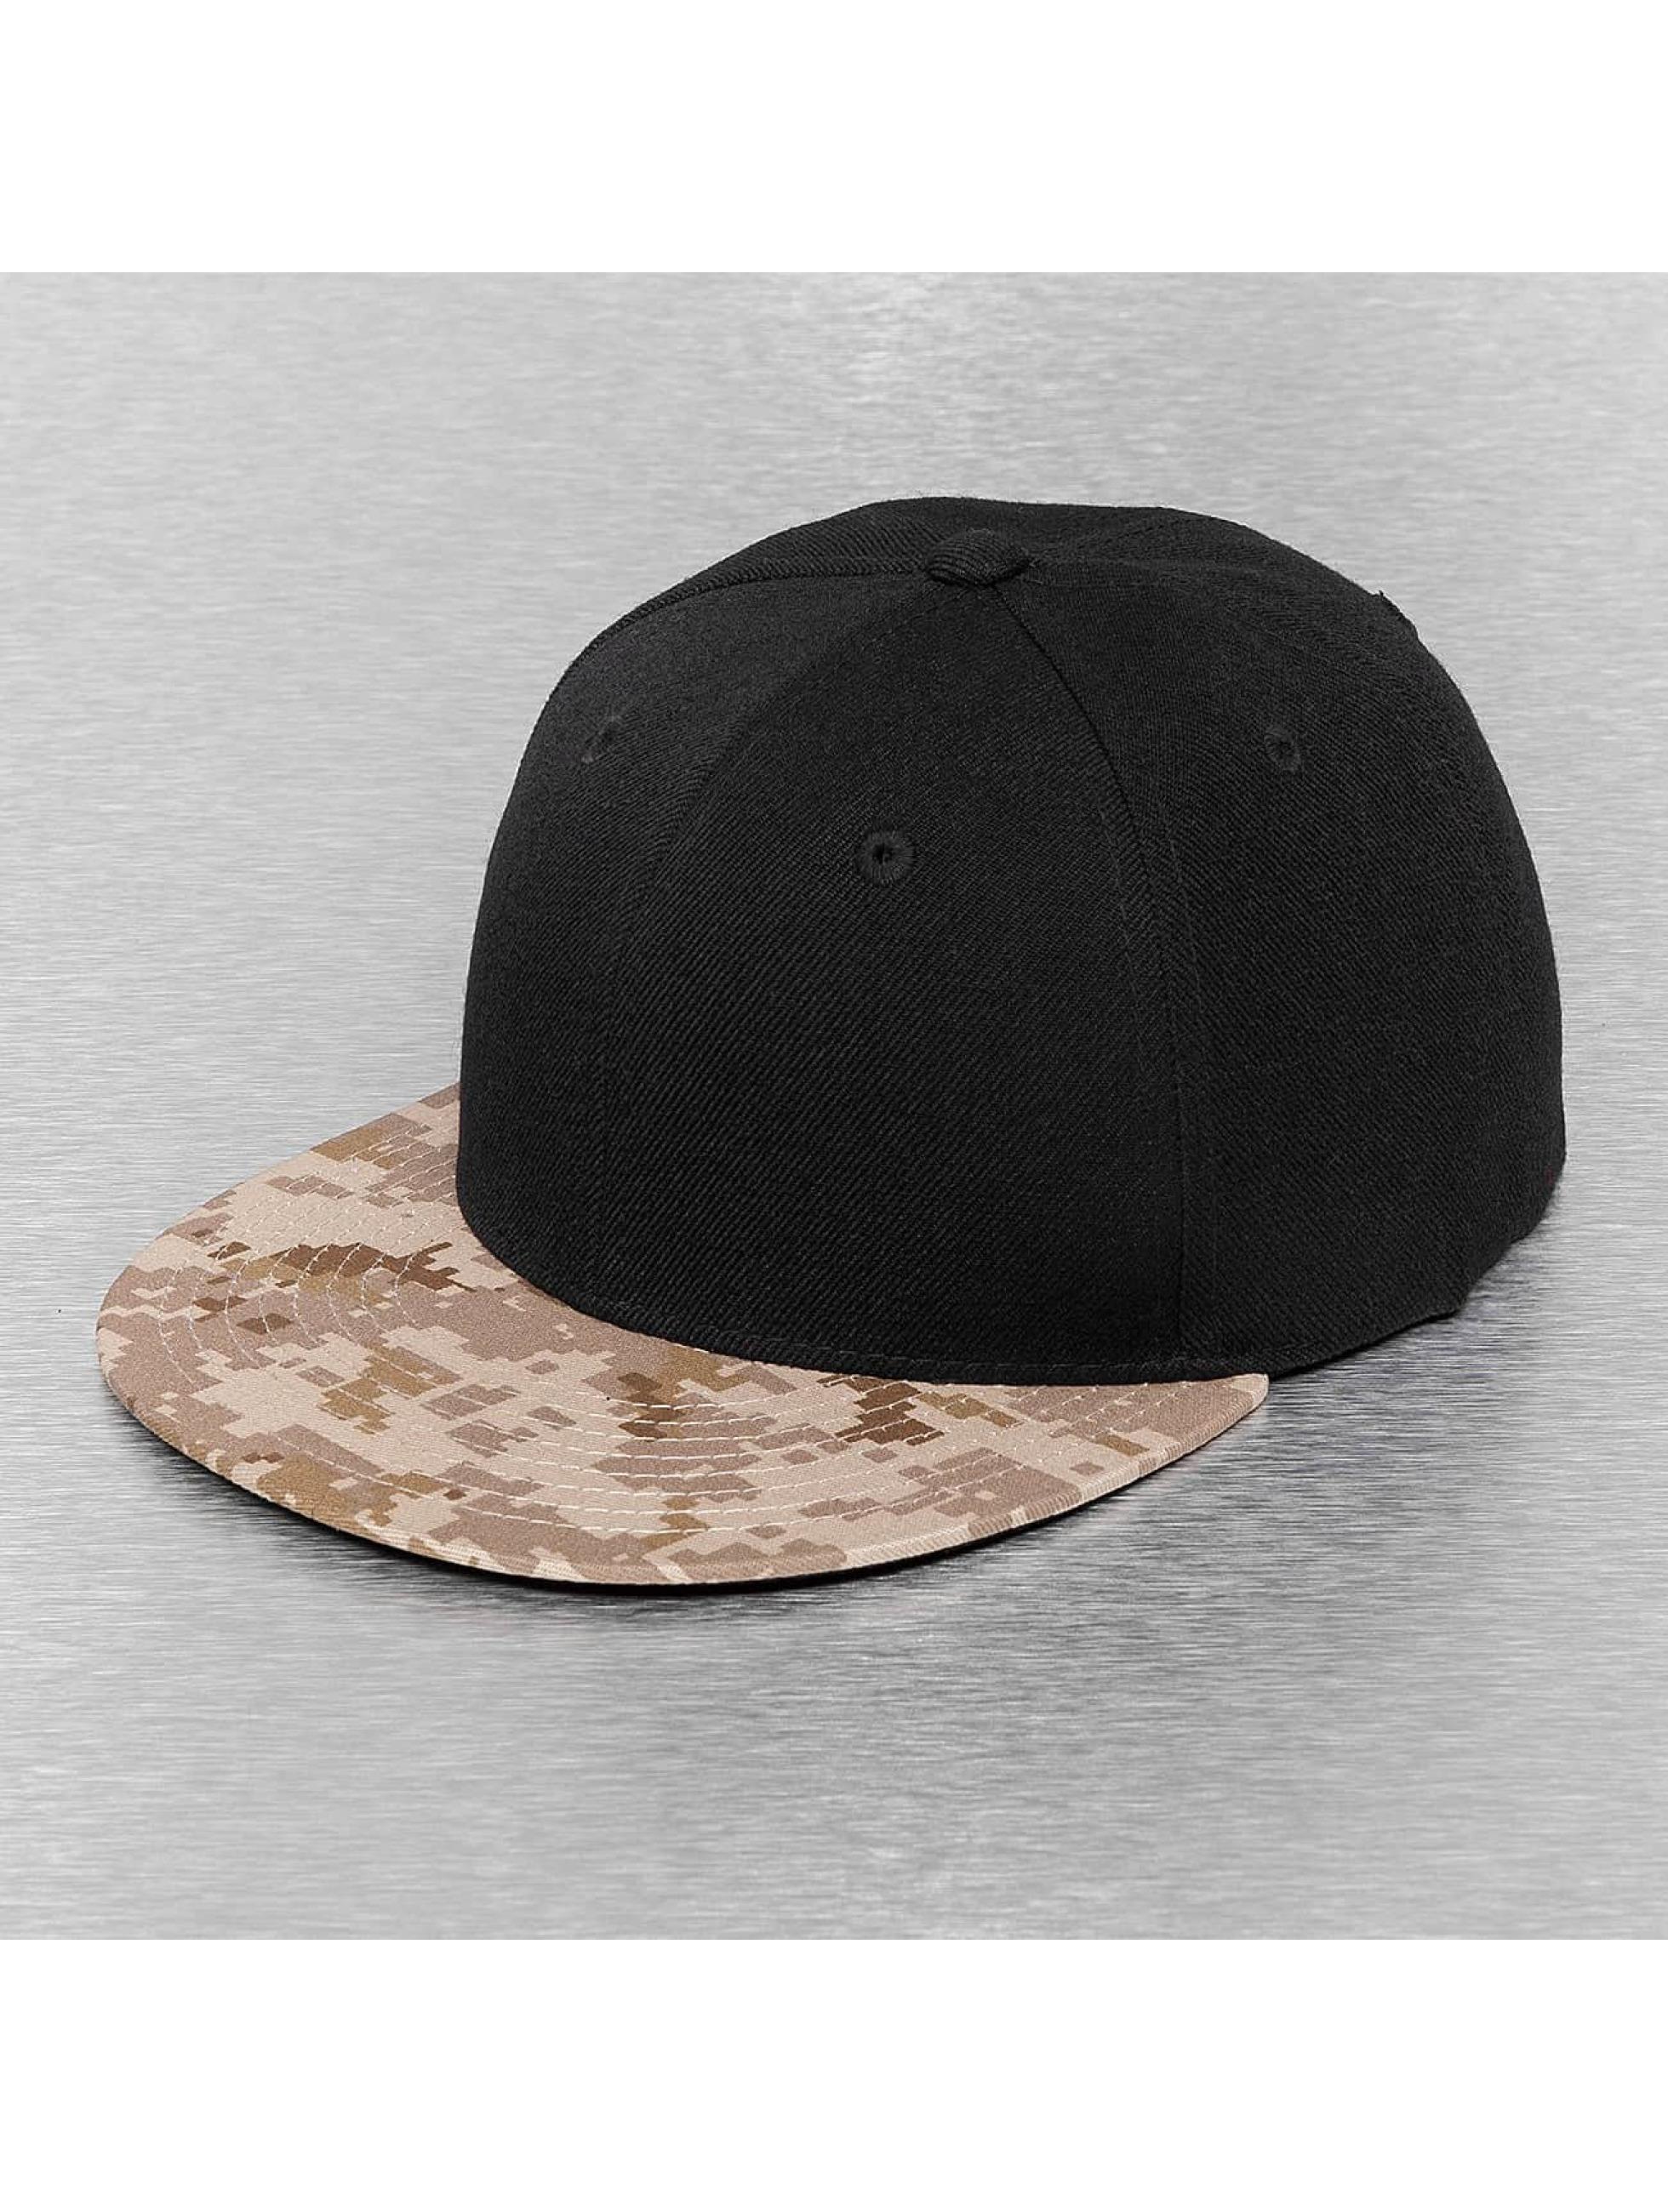 Cap Crony Männer,Frauen Snapback Cap Camo Bill in schwarz